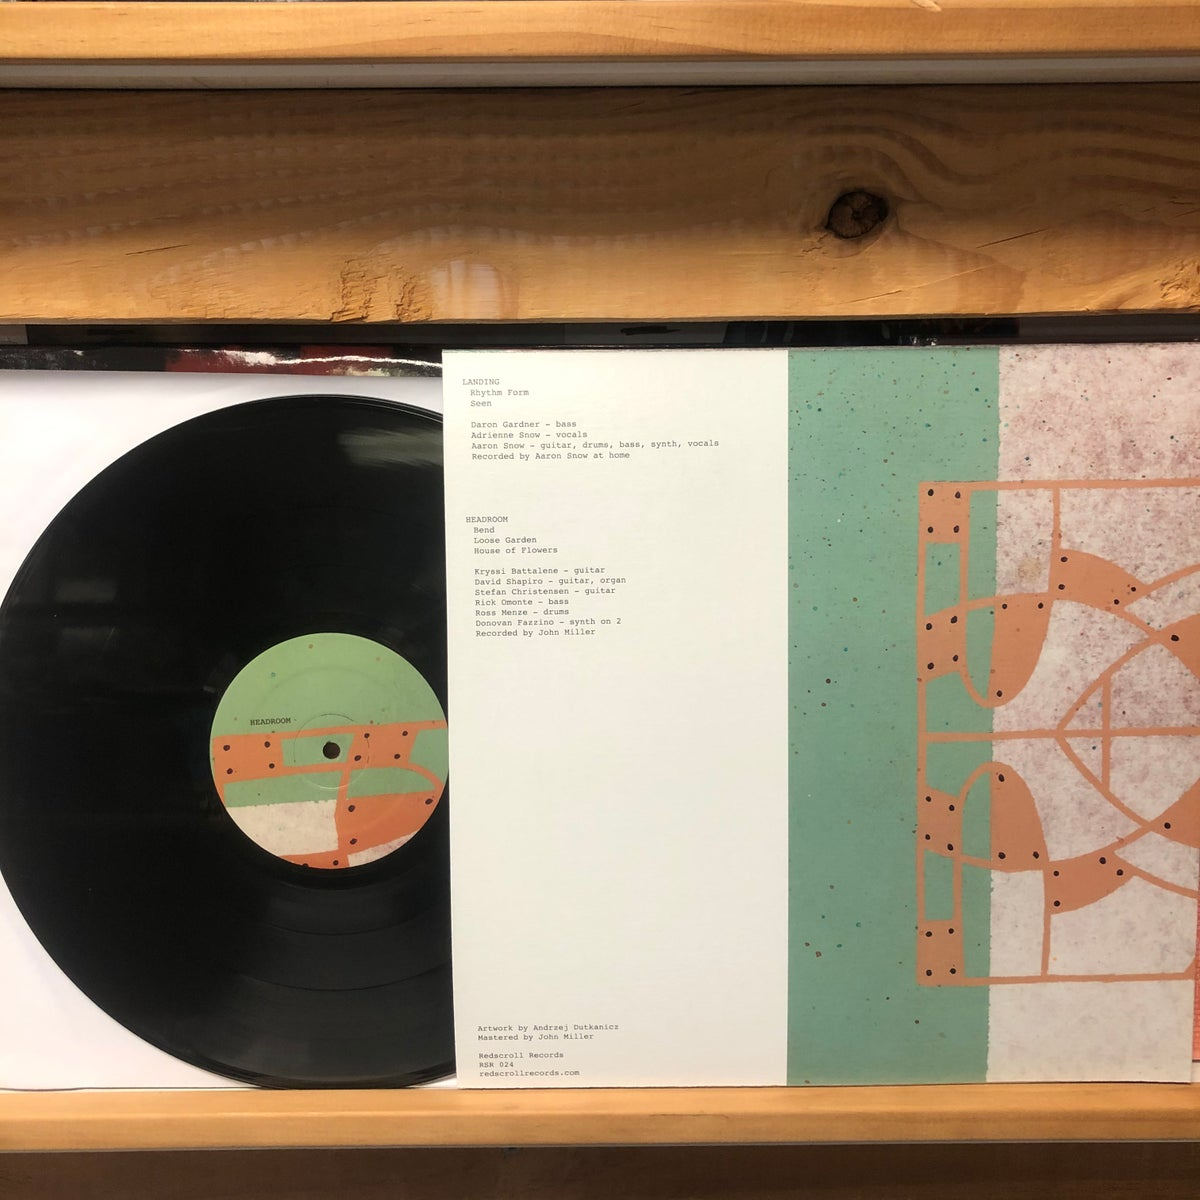 Image of [RSR-024] LANDING / HEADROOM LP